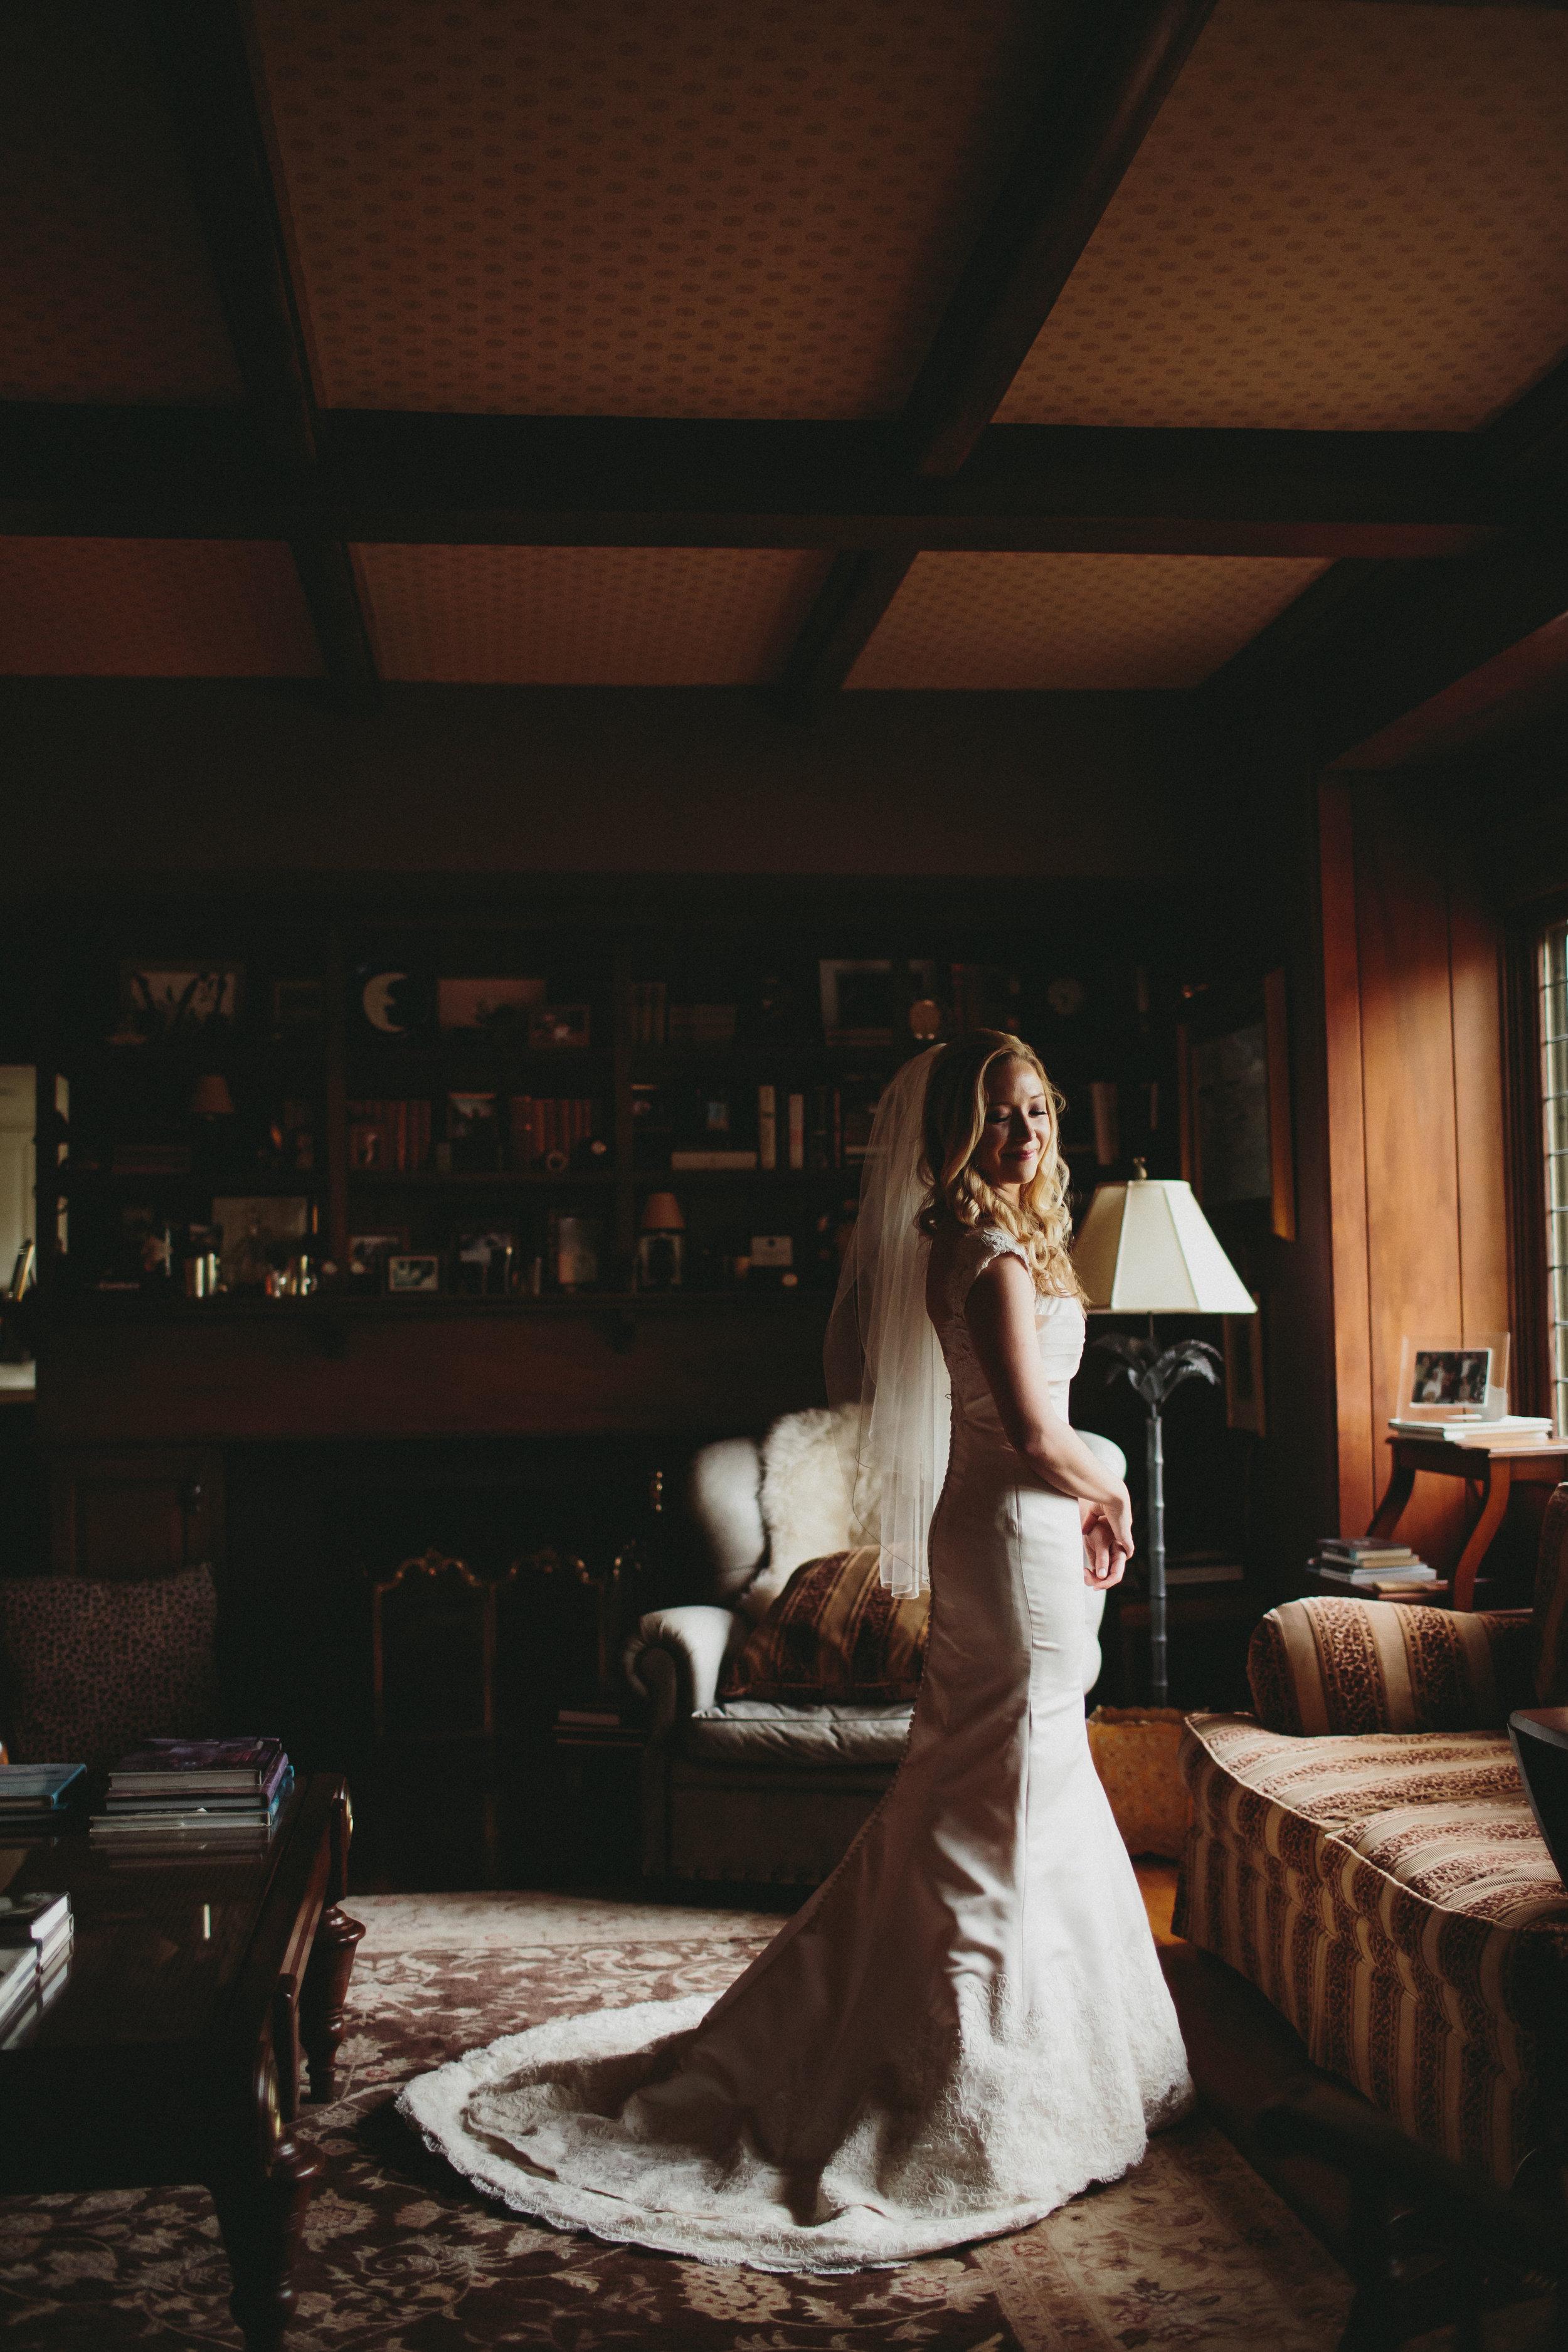 the_carrs_photography_katie_matt_wedding_0183.jpg